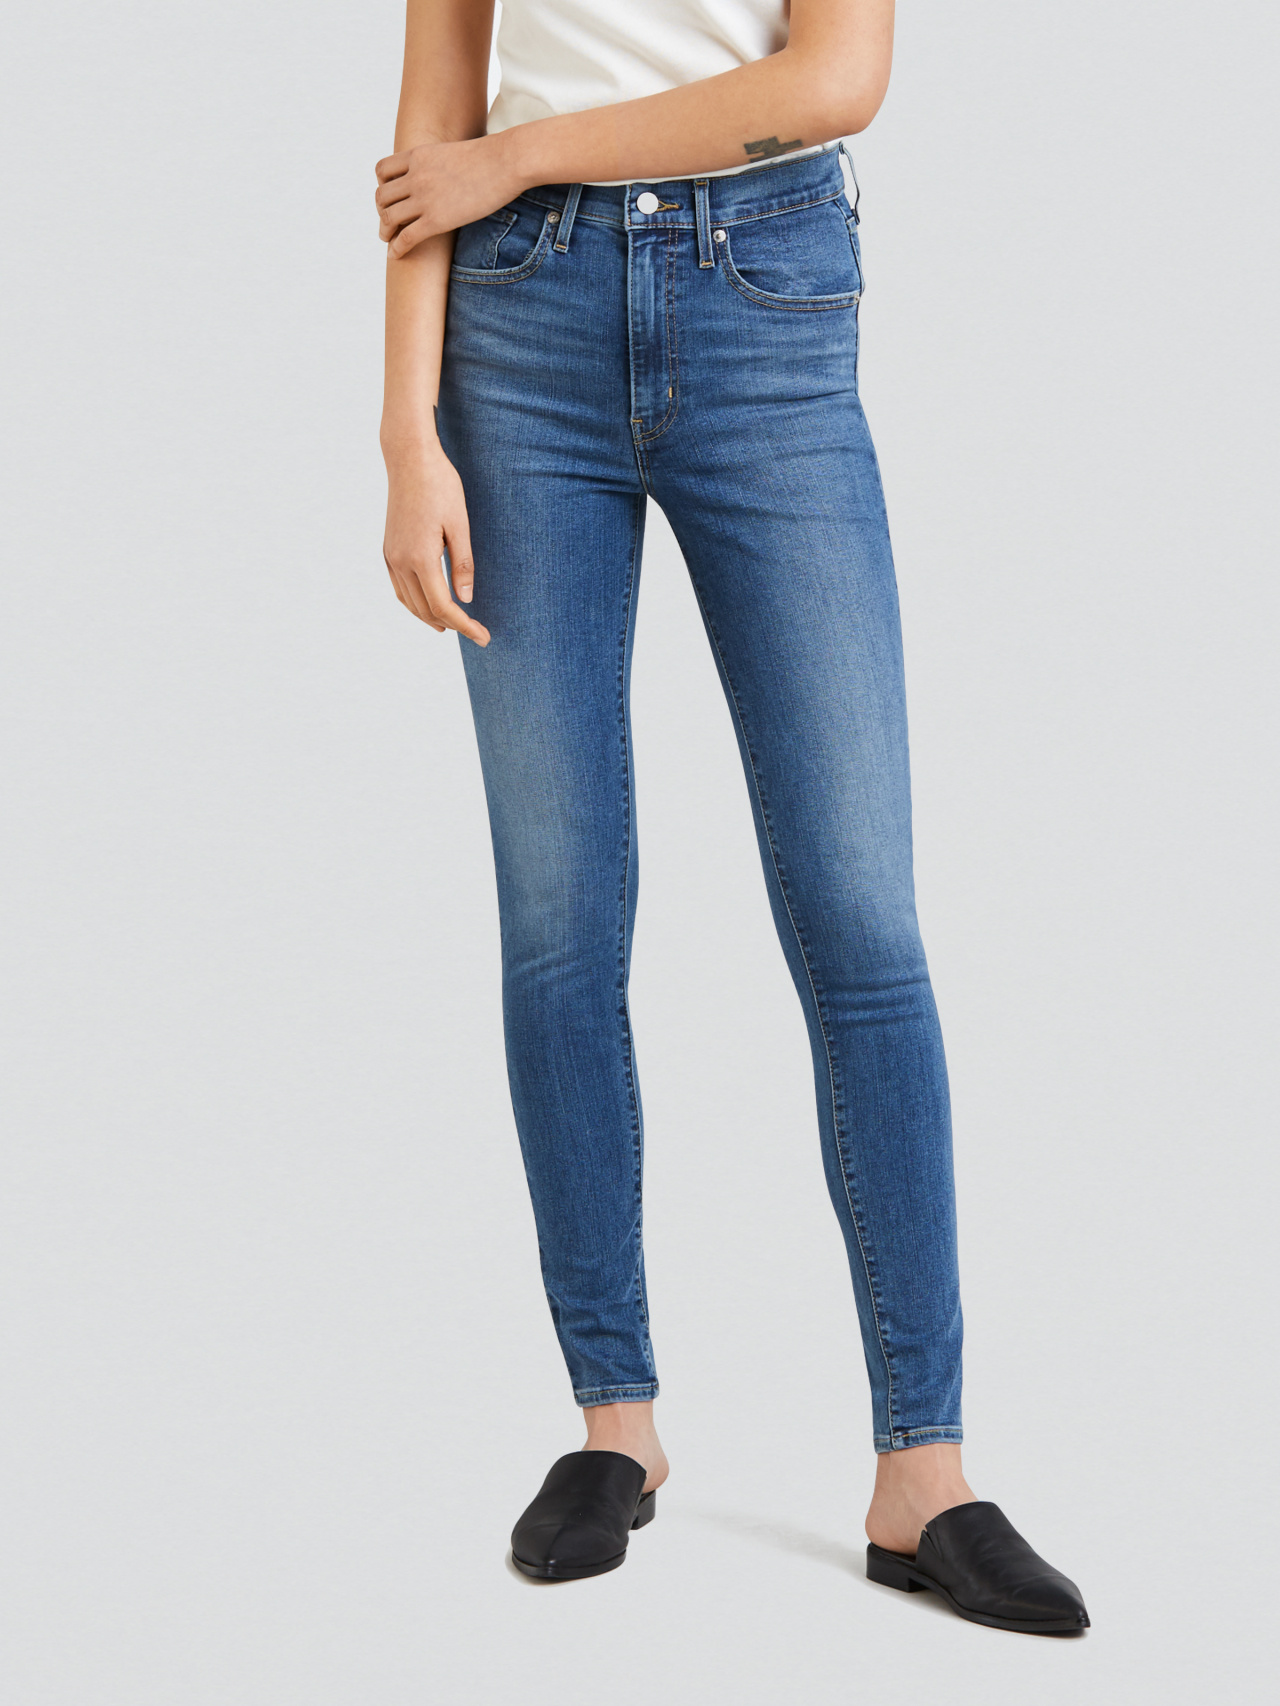 Levi's Indigo Lounge Mile High Sculpt Jeans